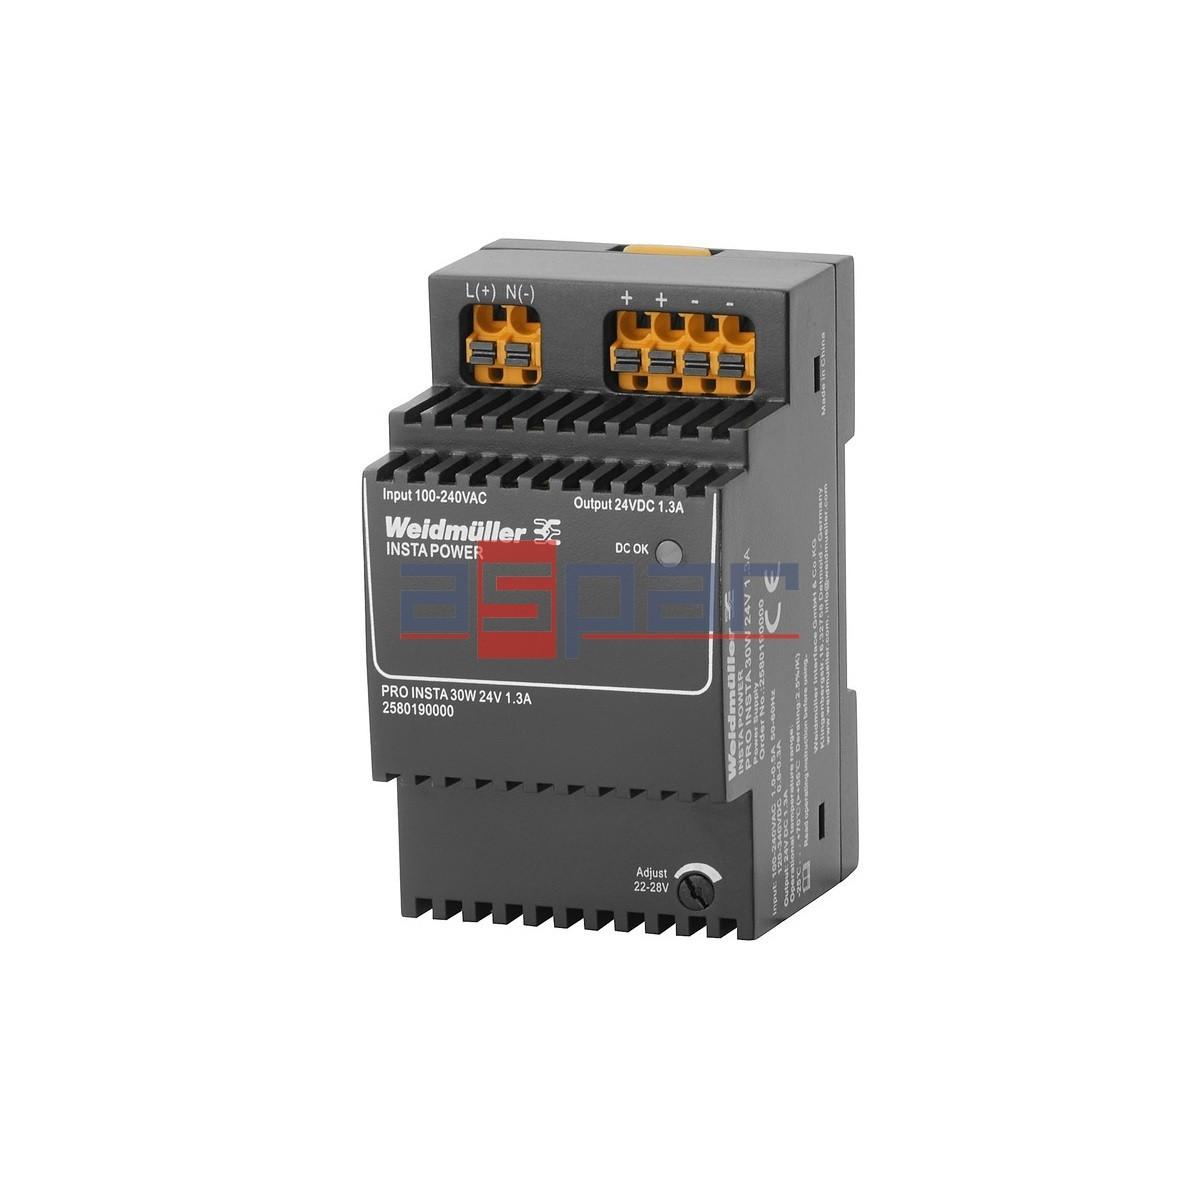 zasilacz impulsowy, 24 V, PRO INSTA 30W 24V 1.3A